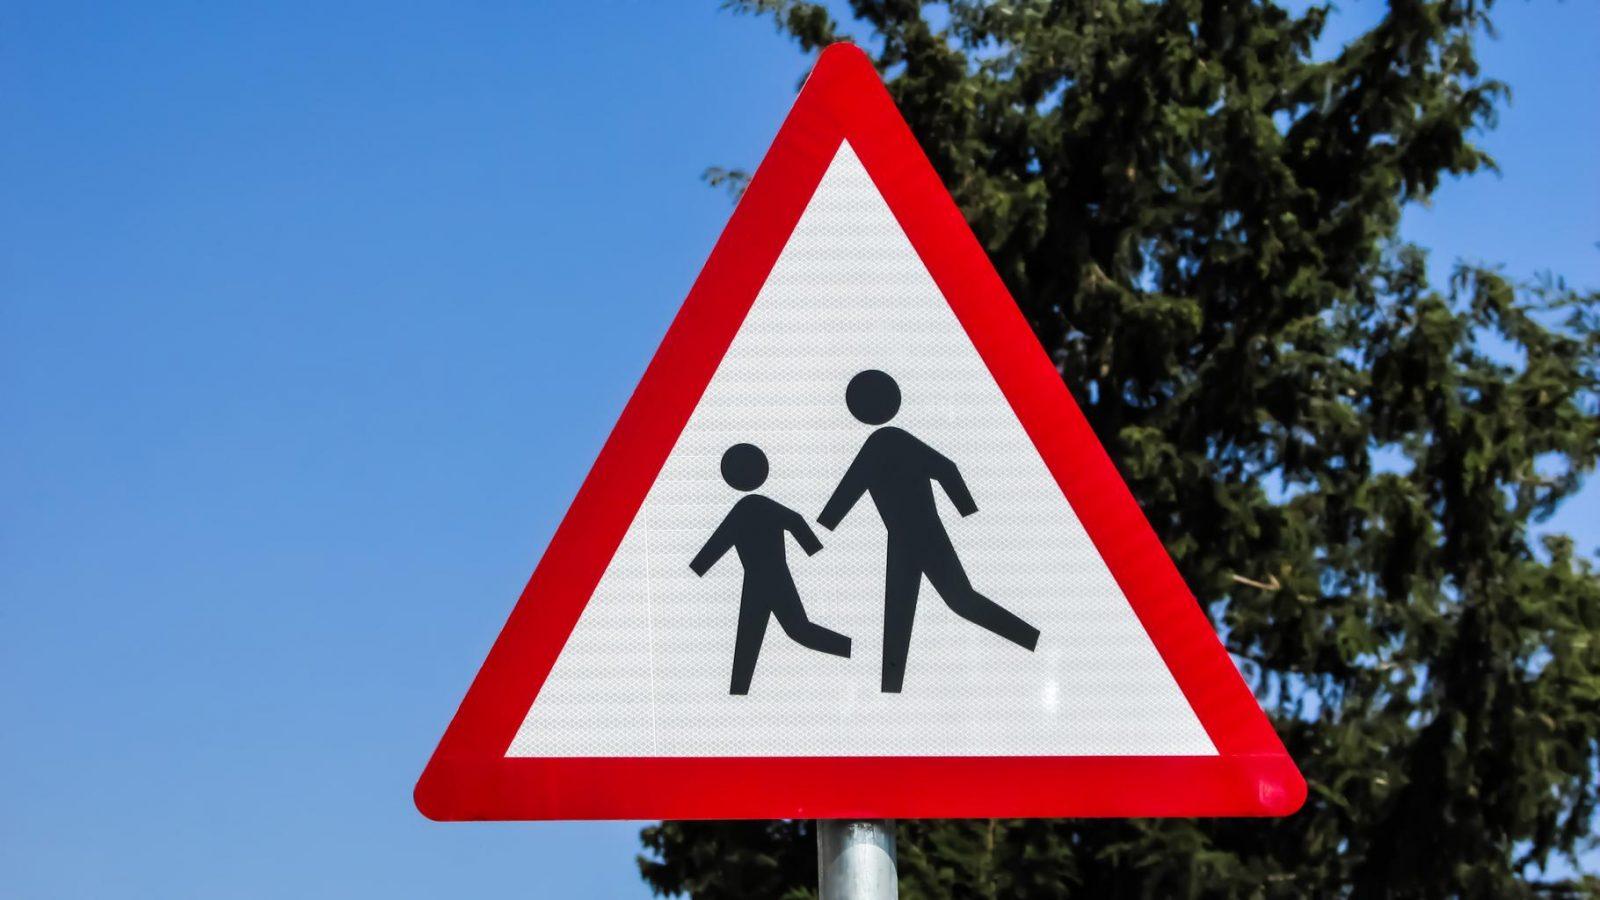 Warning school children crossing